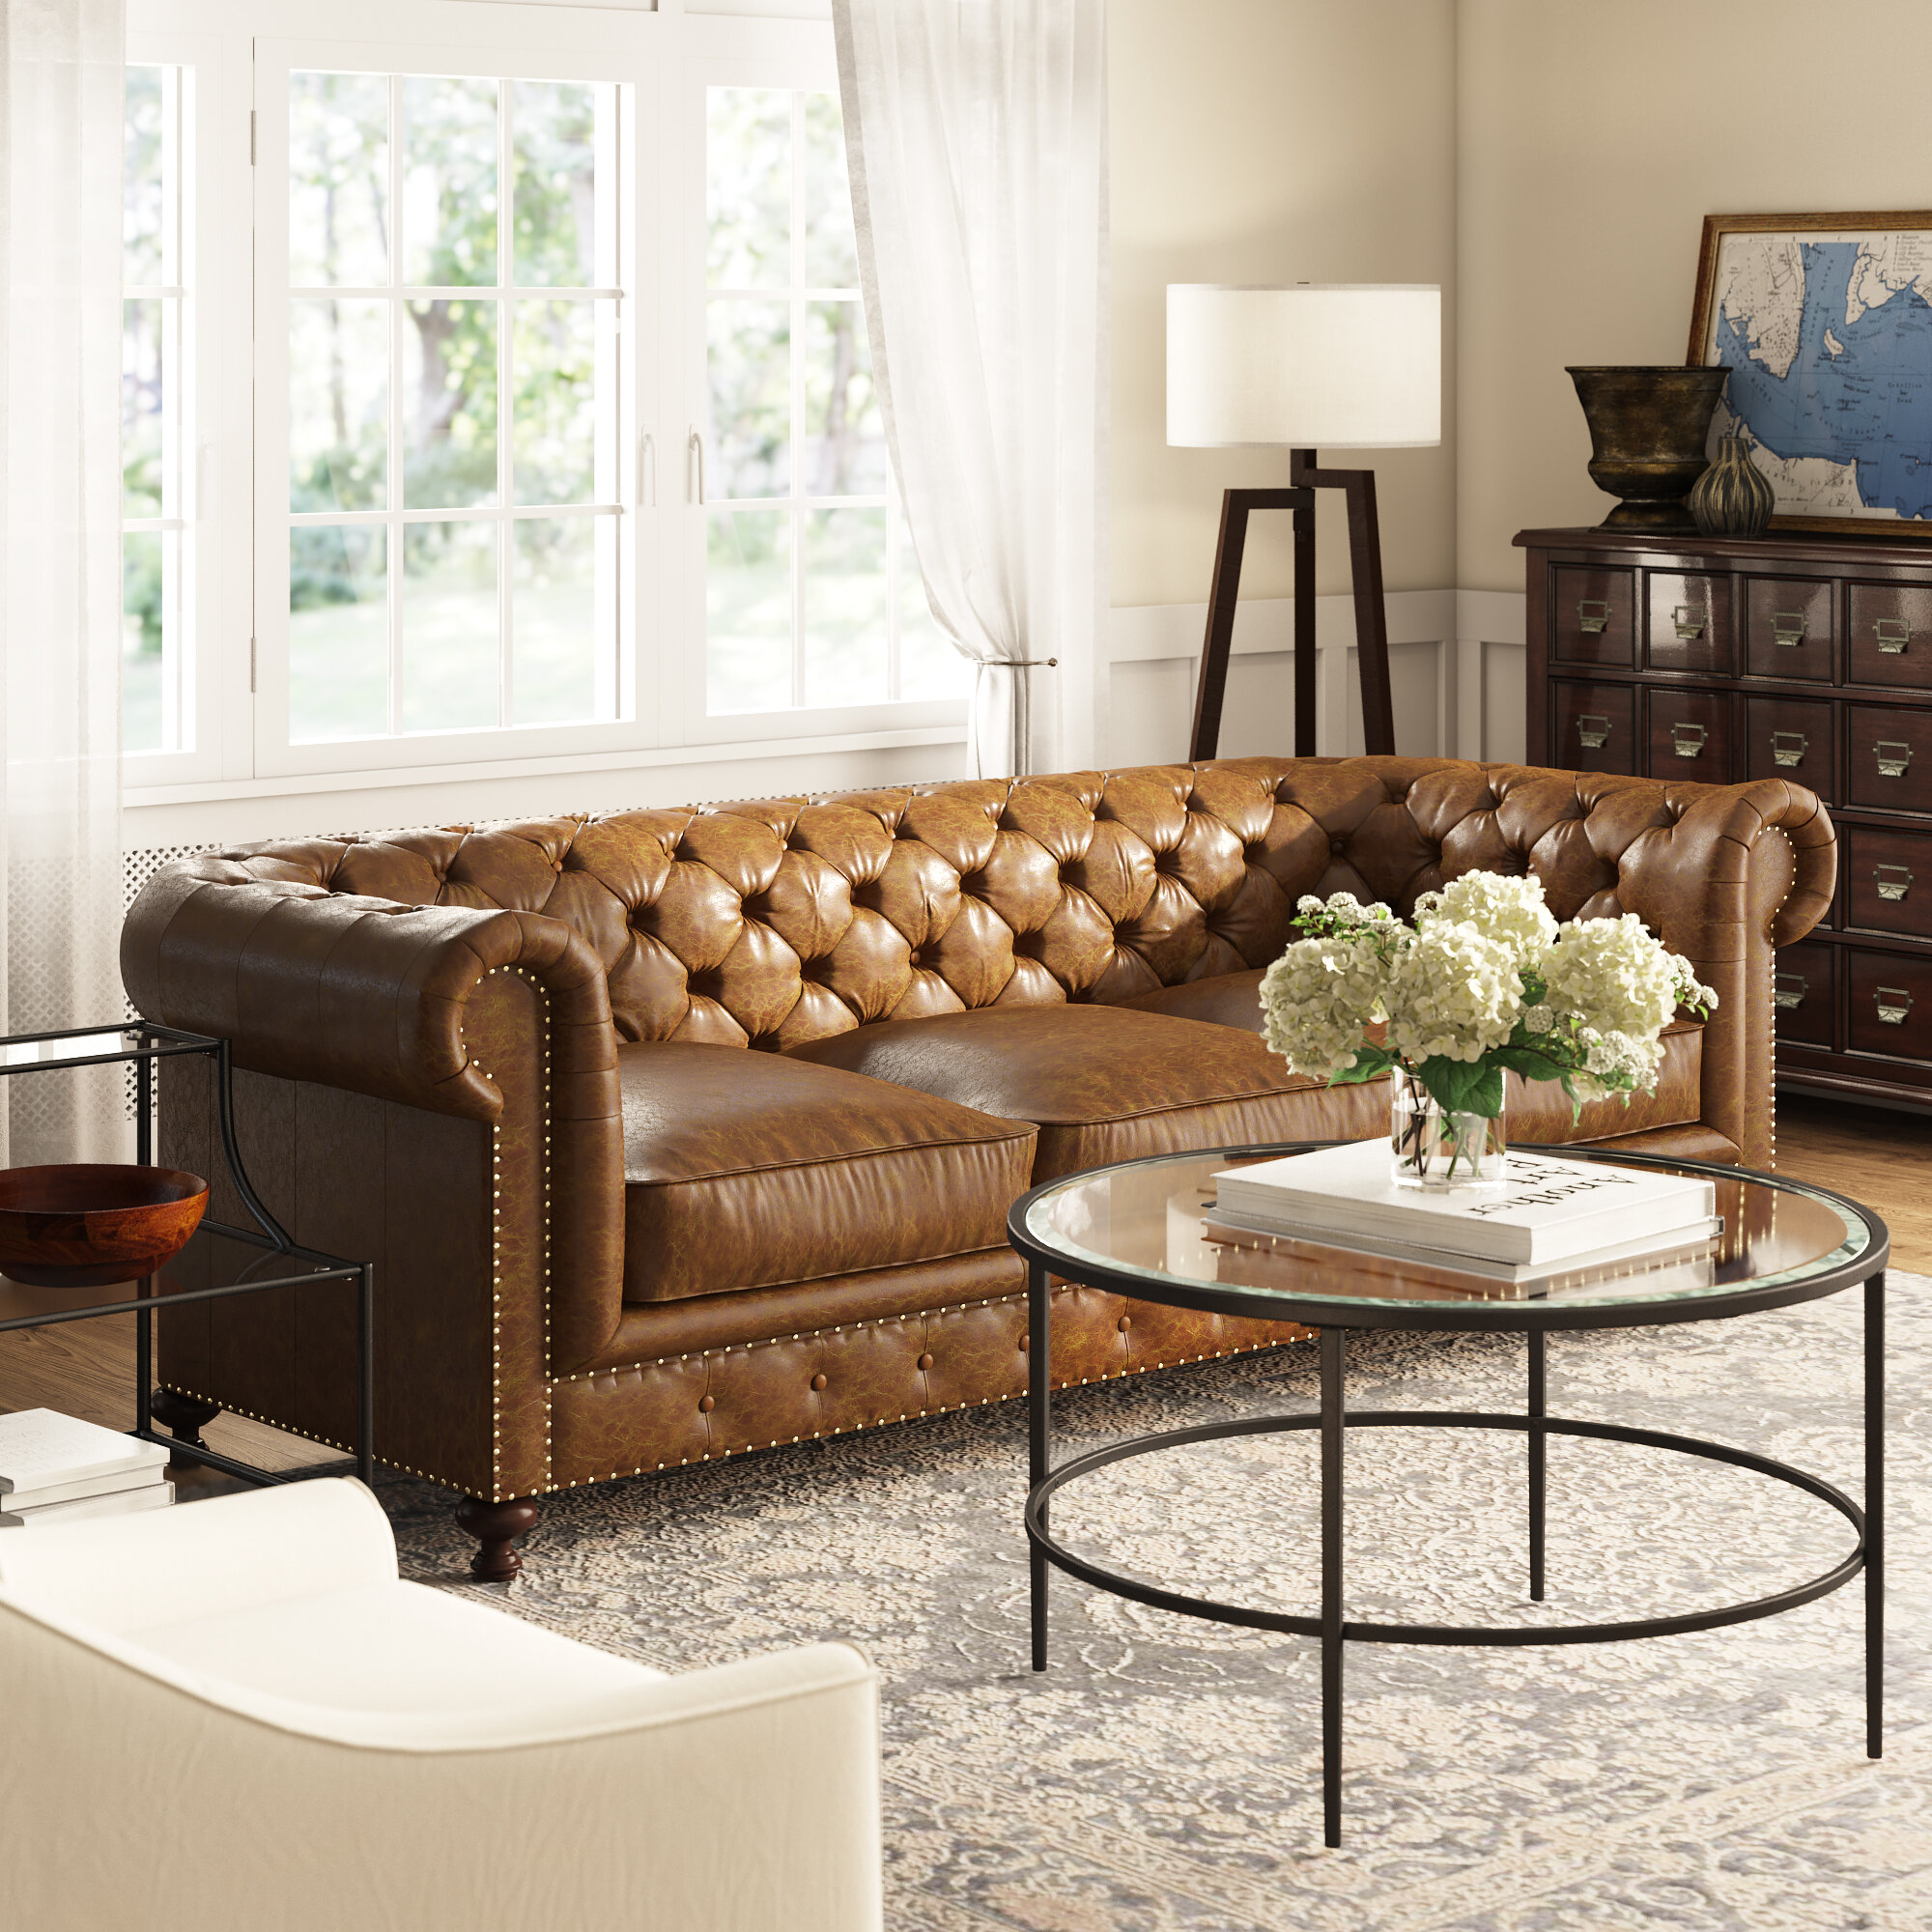 Enjoyable Julesburg Leather Chesterfield Sofa Creativecarmelina Interior Chair Design Creativecarmelinacom